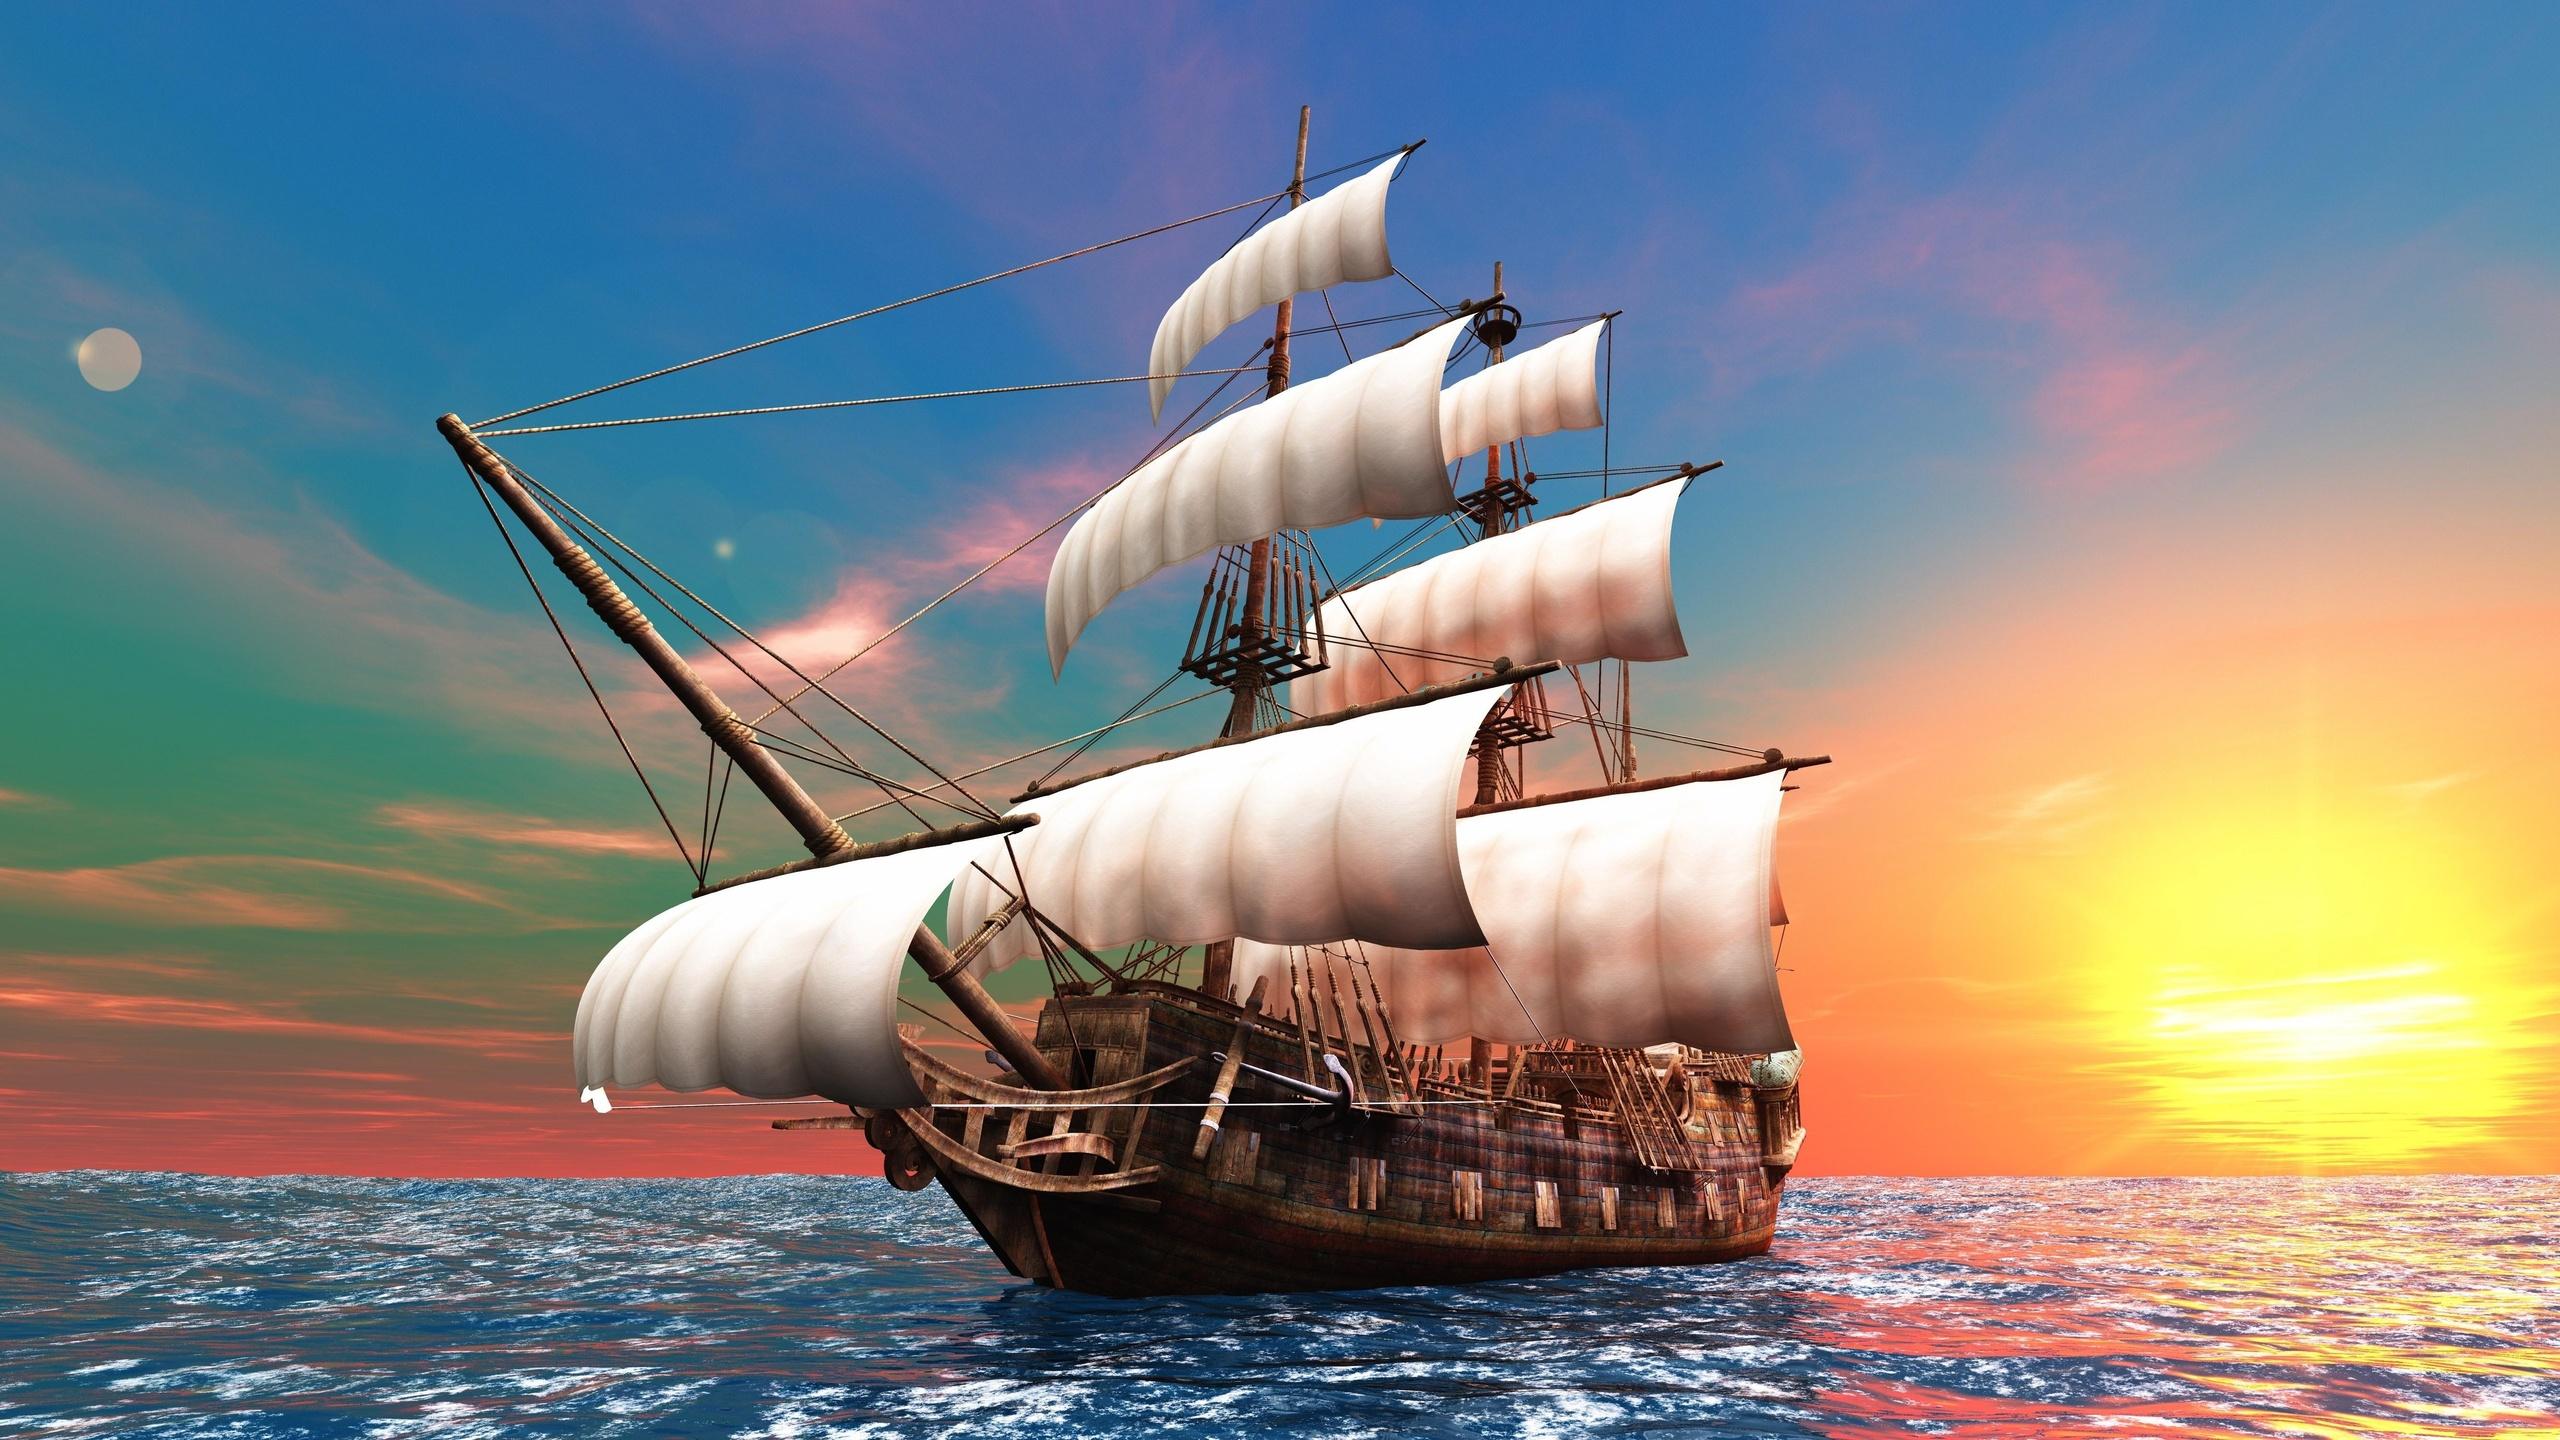 Картинка море корабль